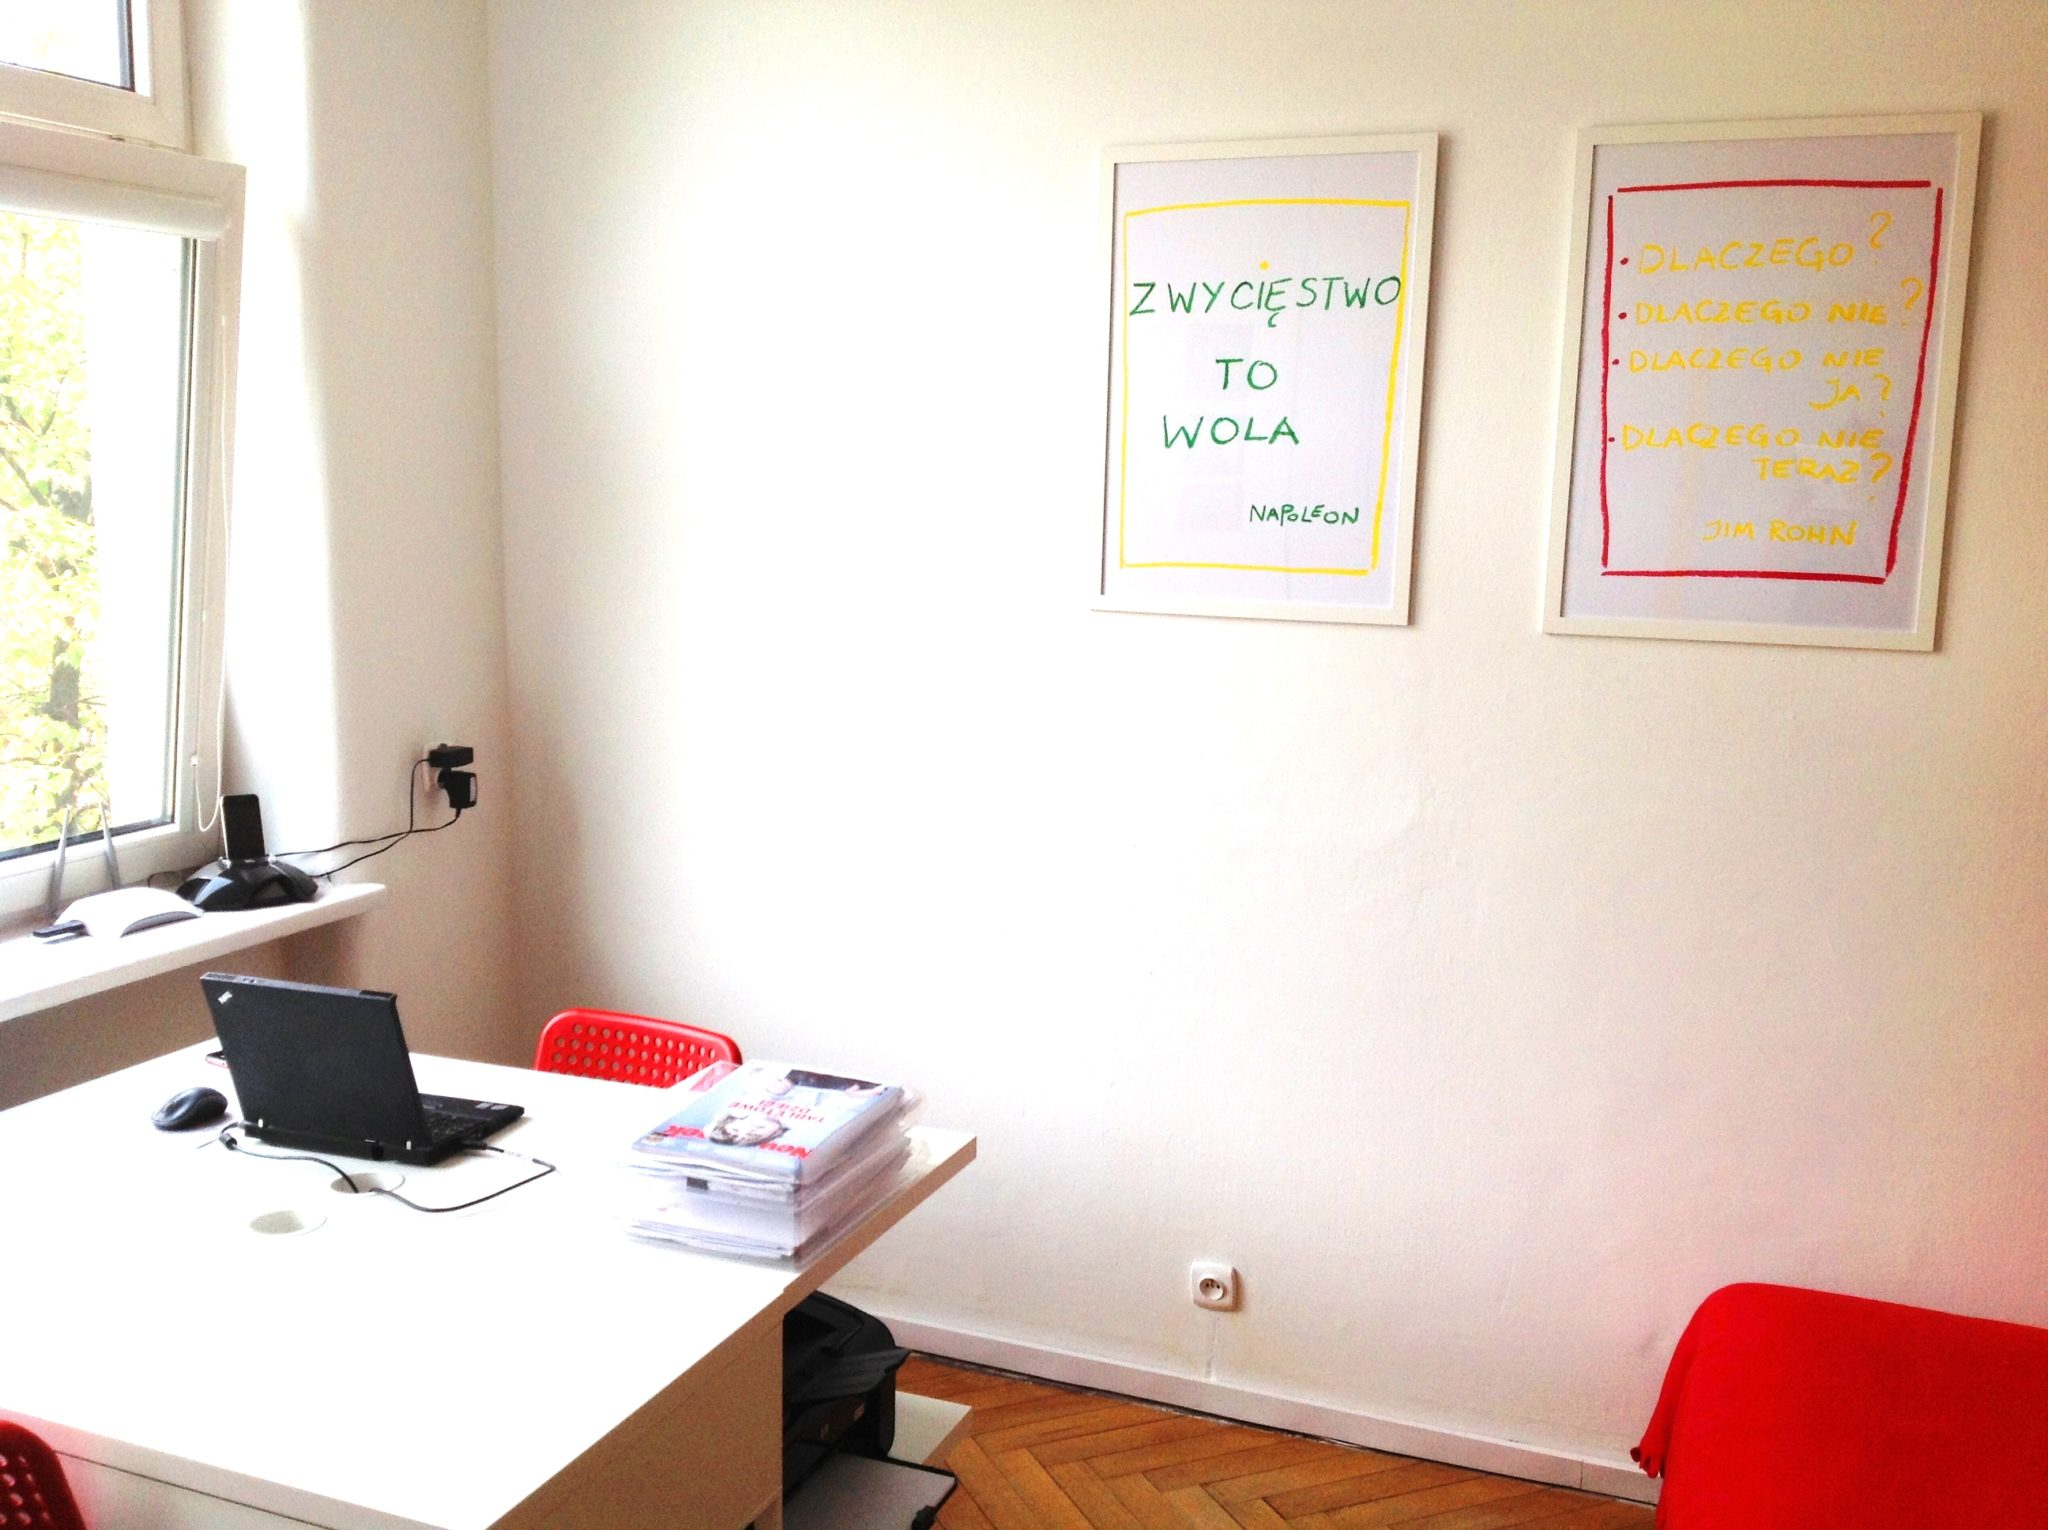 11 projekt wnetrza male kolorowe biuro interior design small colorful office google style forelementspl